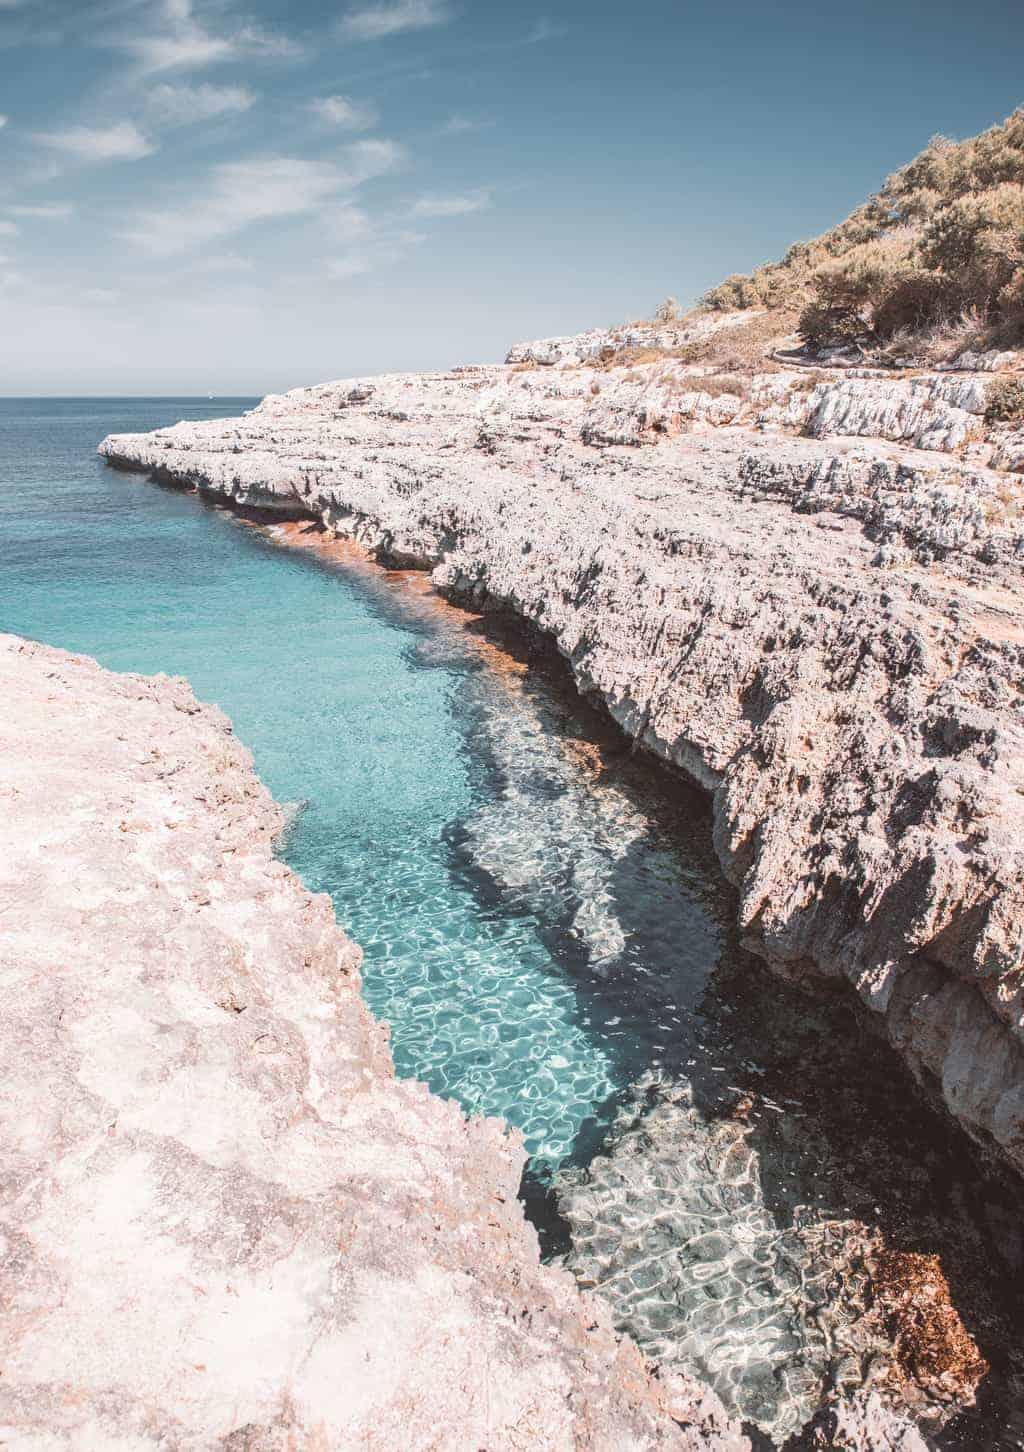 Clear blue water at beach in Mallorca, Spain.